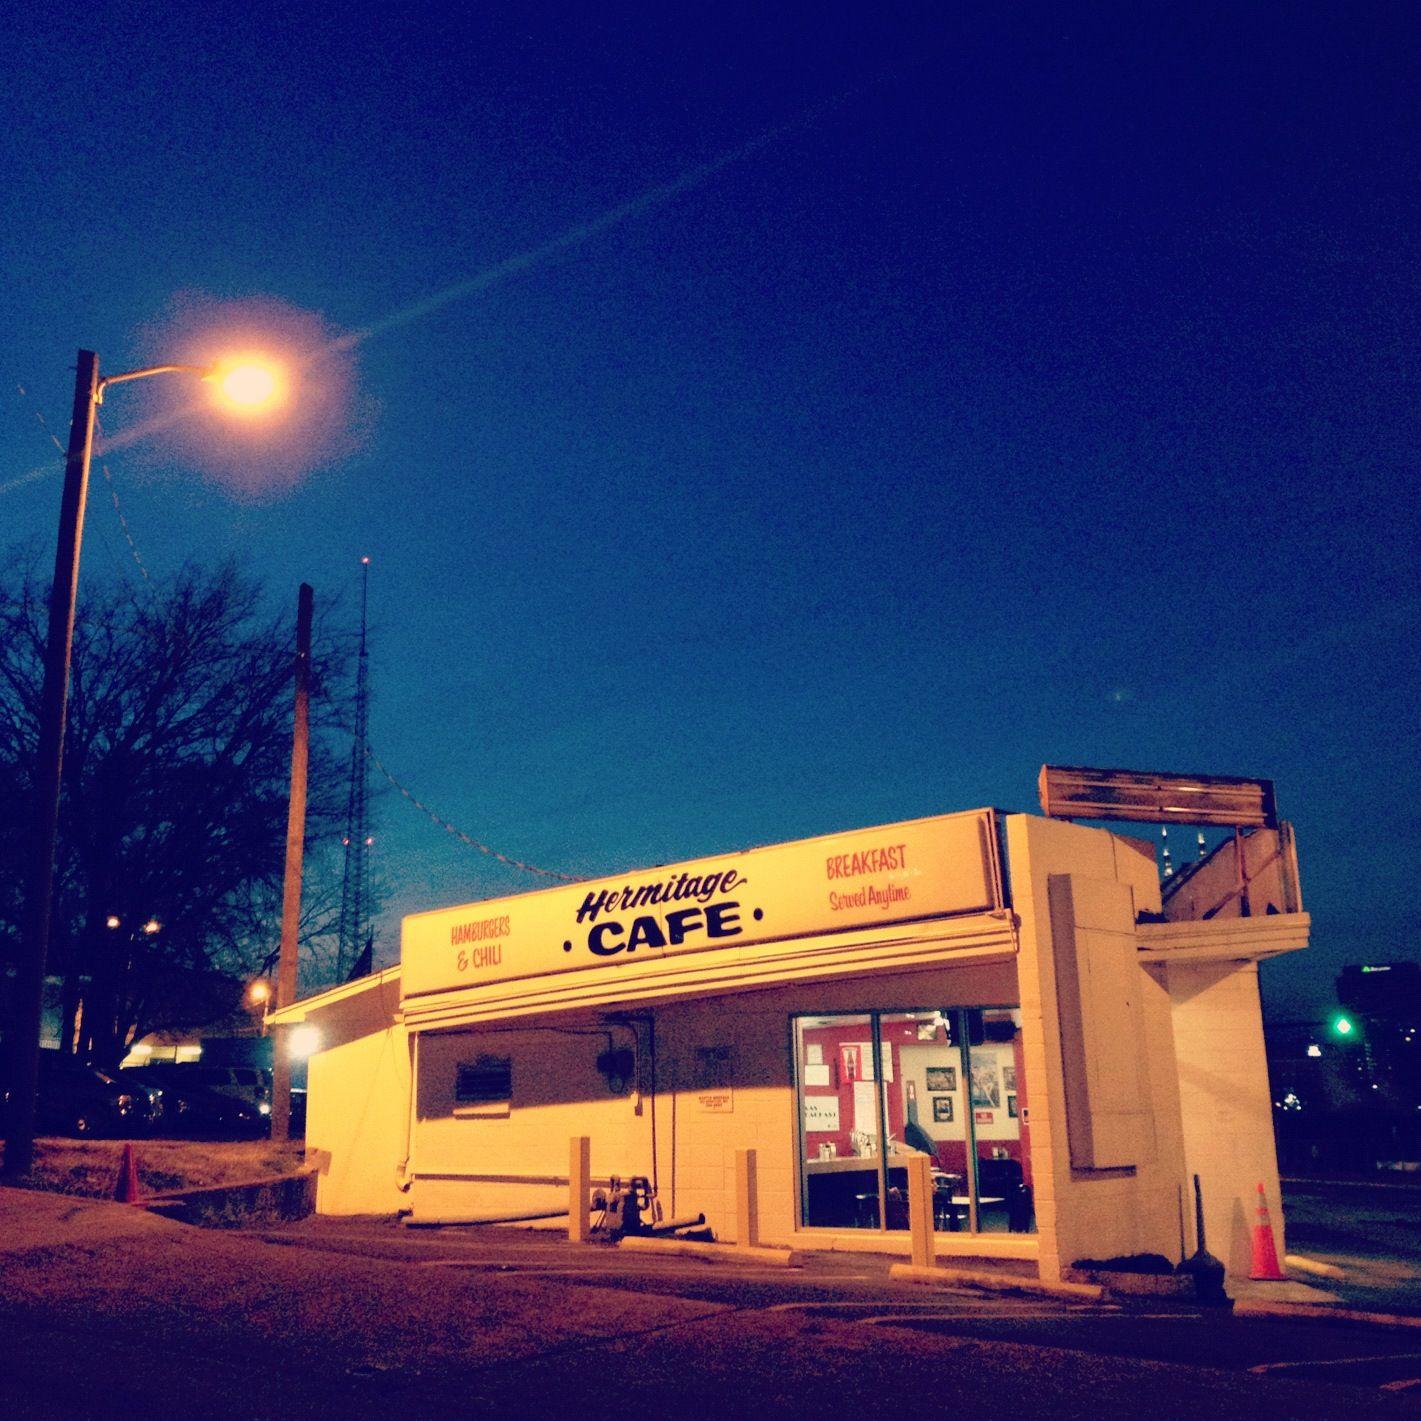 Hermitage Cafe / Nashville, TN